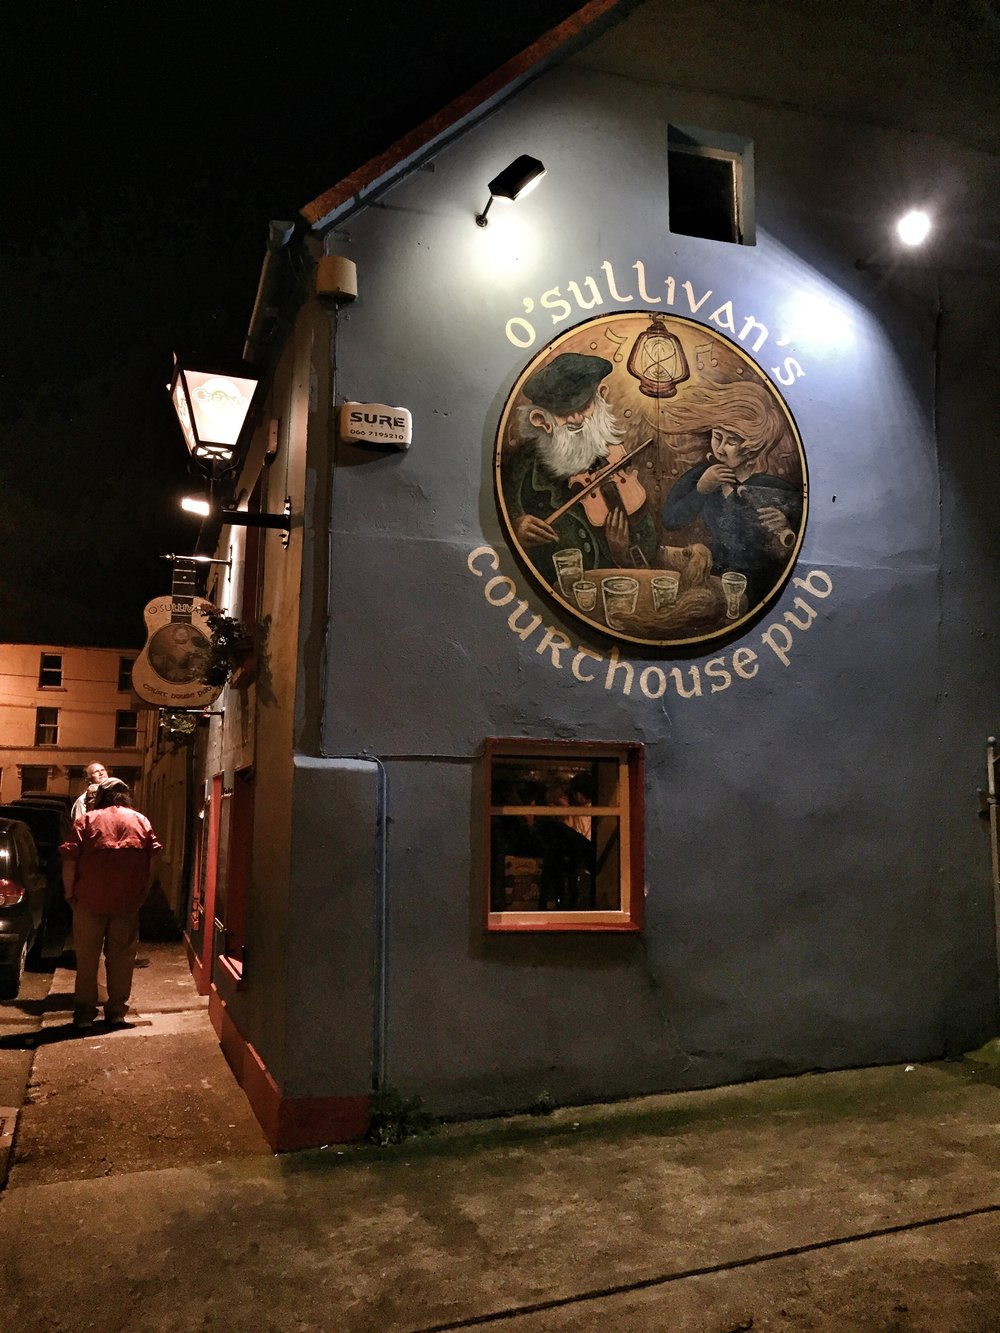 Irish pub with traditional music